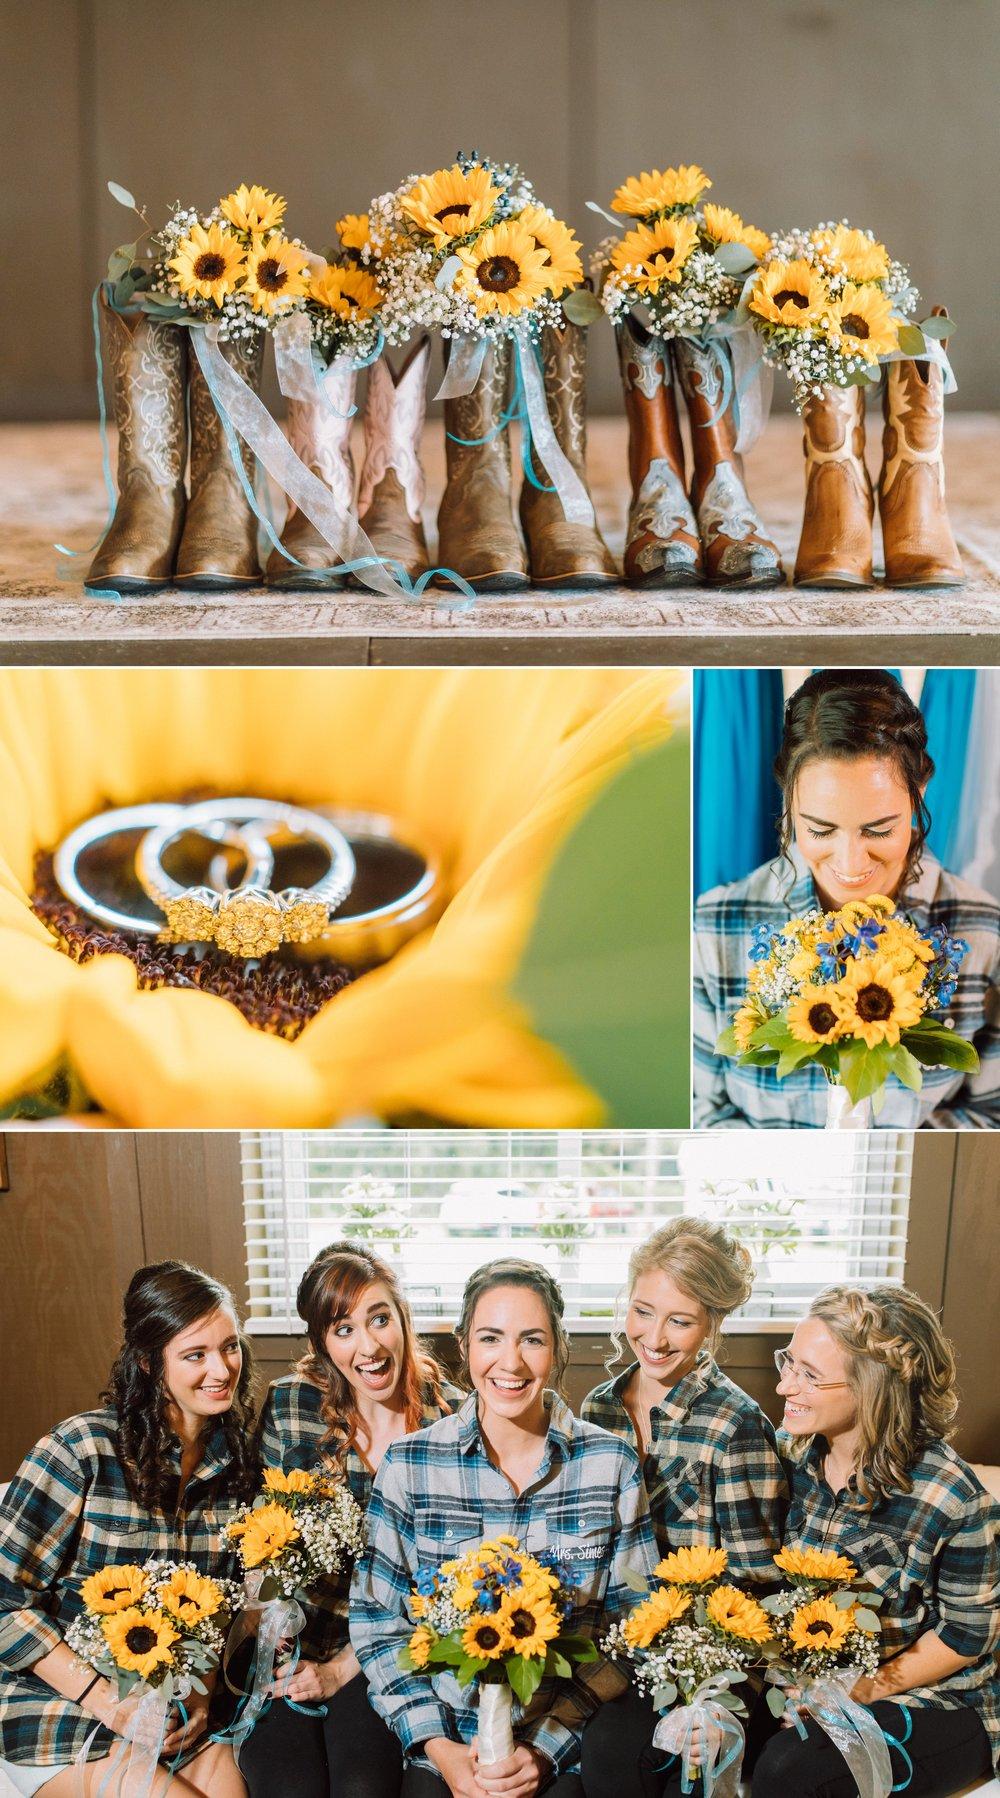 Rustic Sunflower & Blueberry Barn Wedding- Ever After Farms - Allie & NickBlog 6.jpg